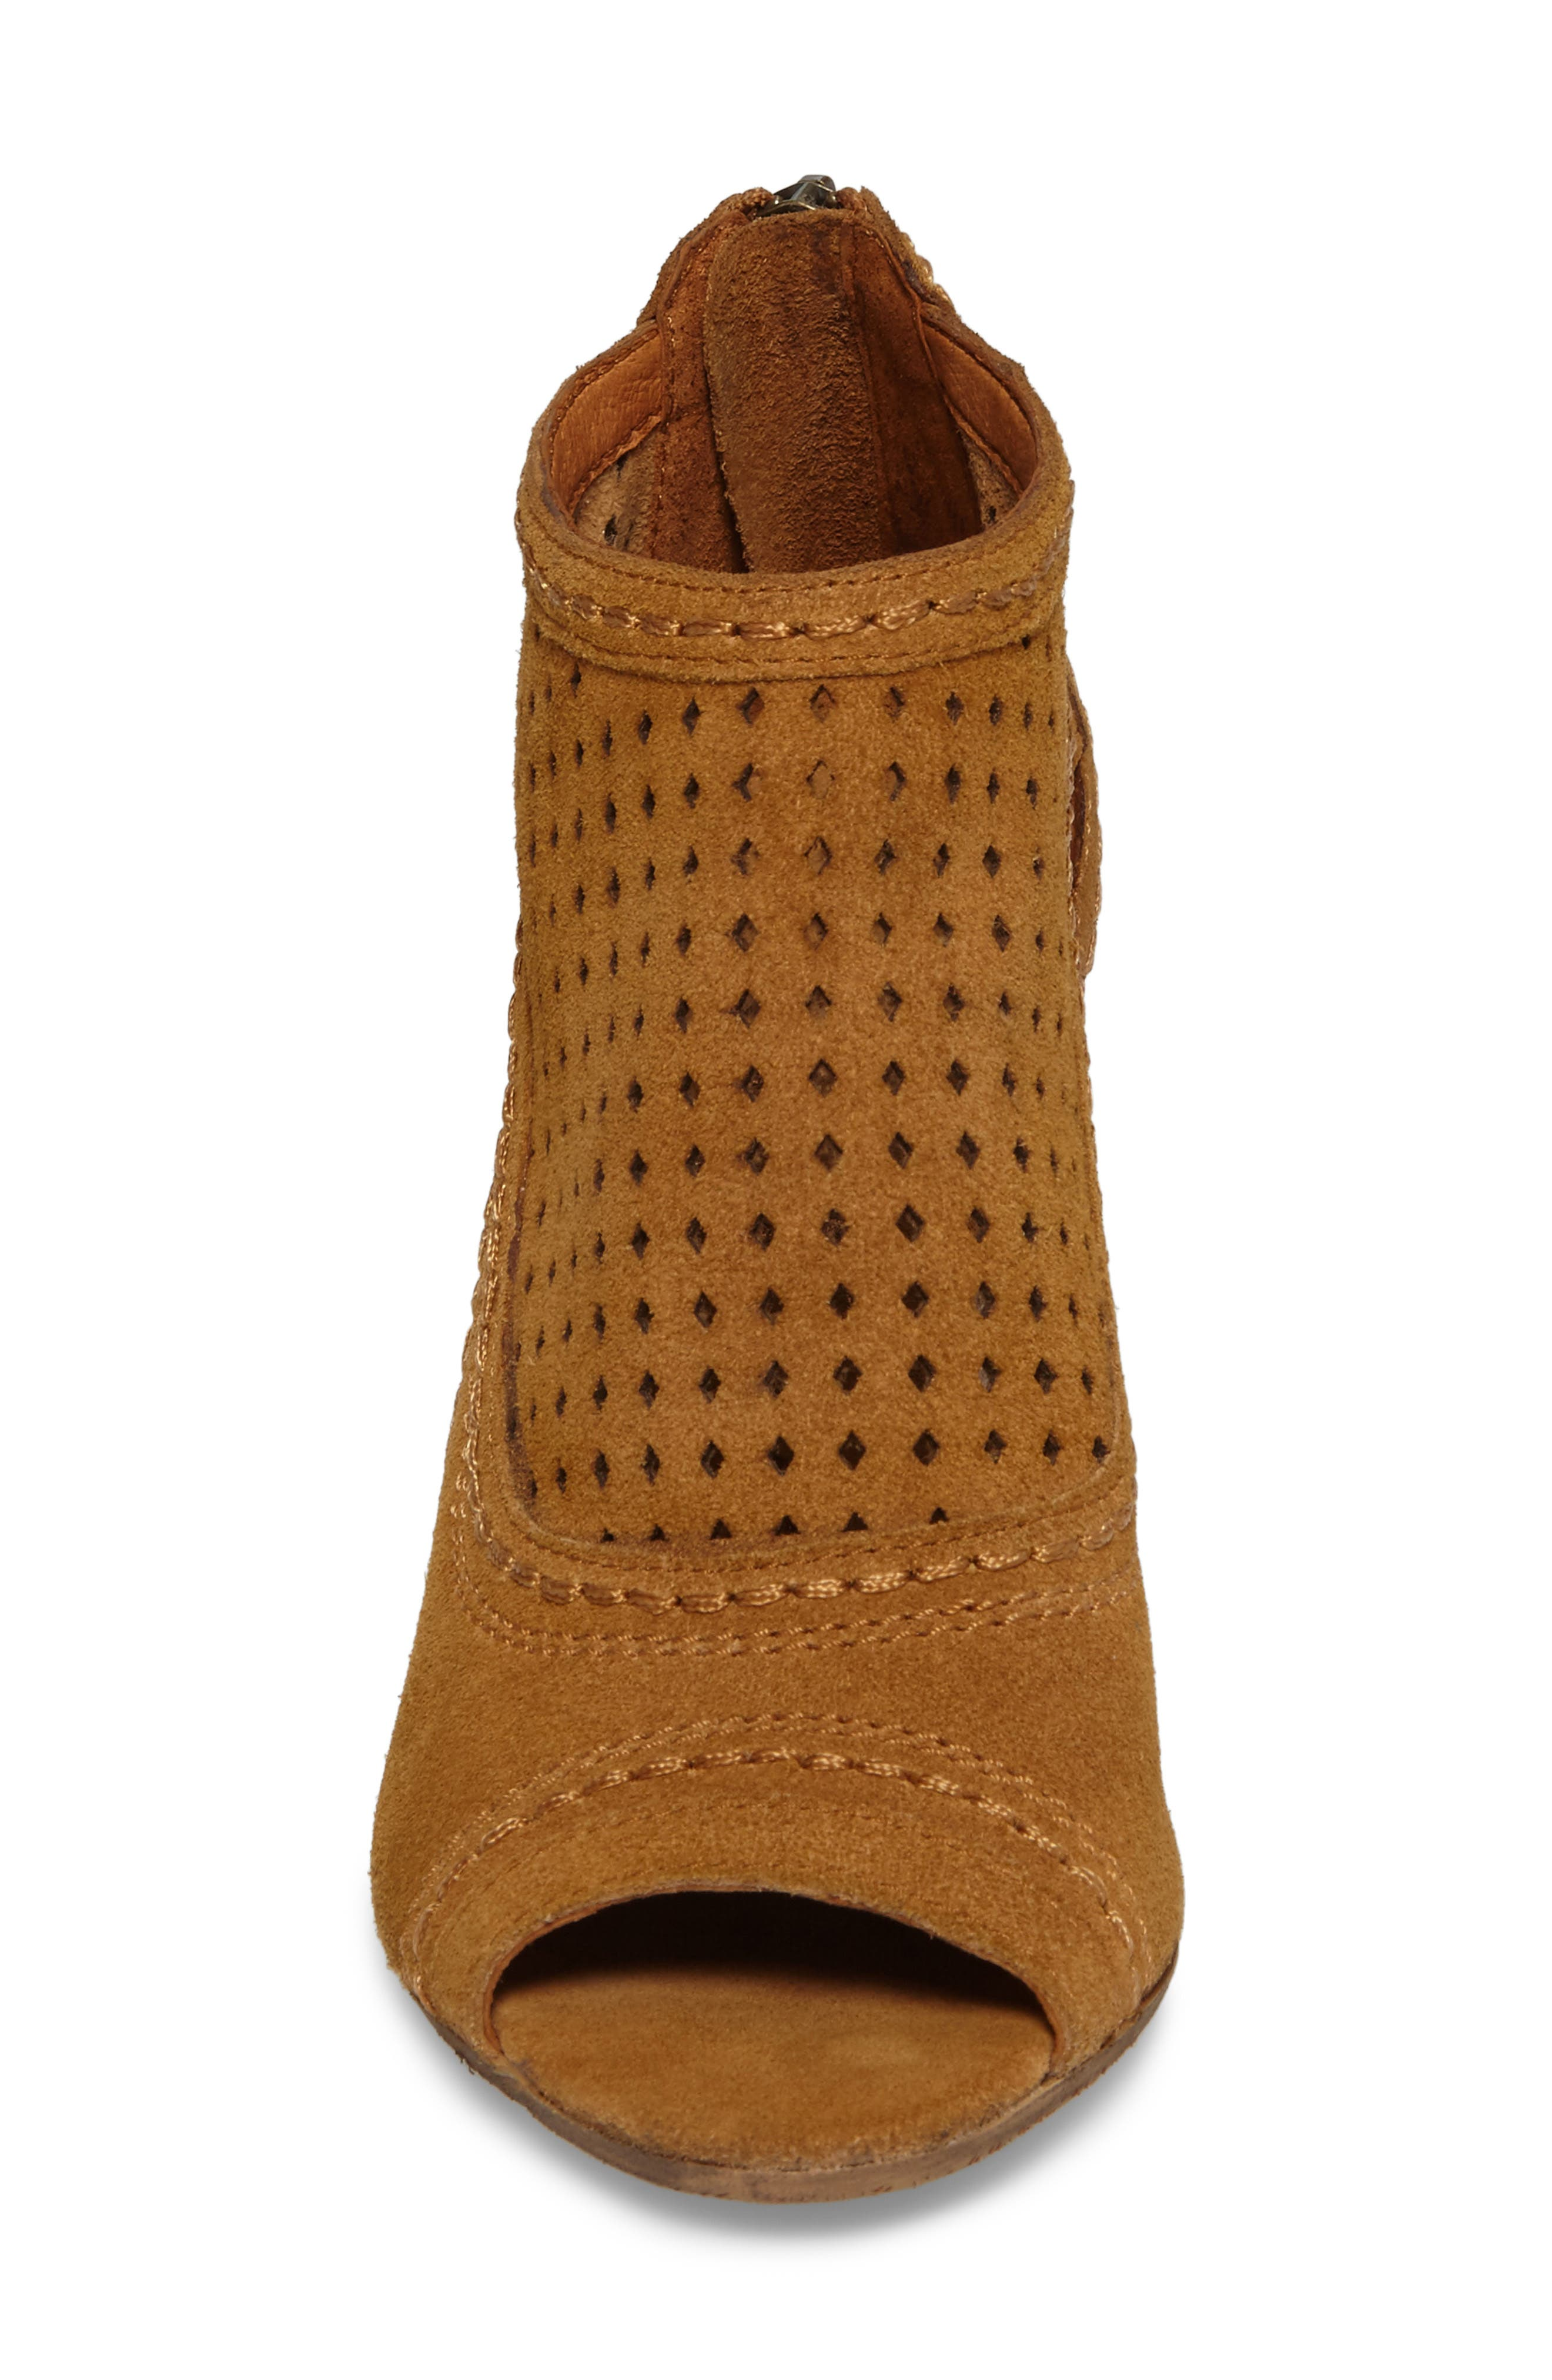 Sharon Perforated Wedge Sandal,                             Alternate thumbnail 7, color,